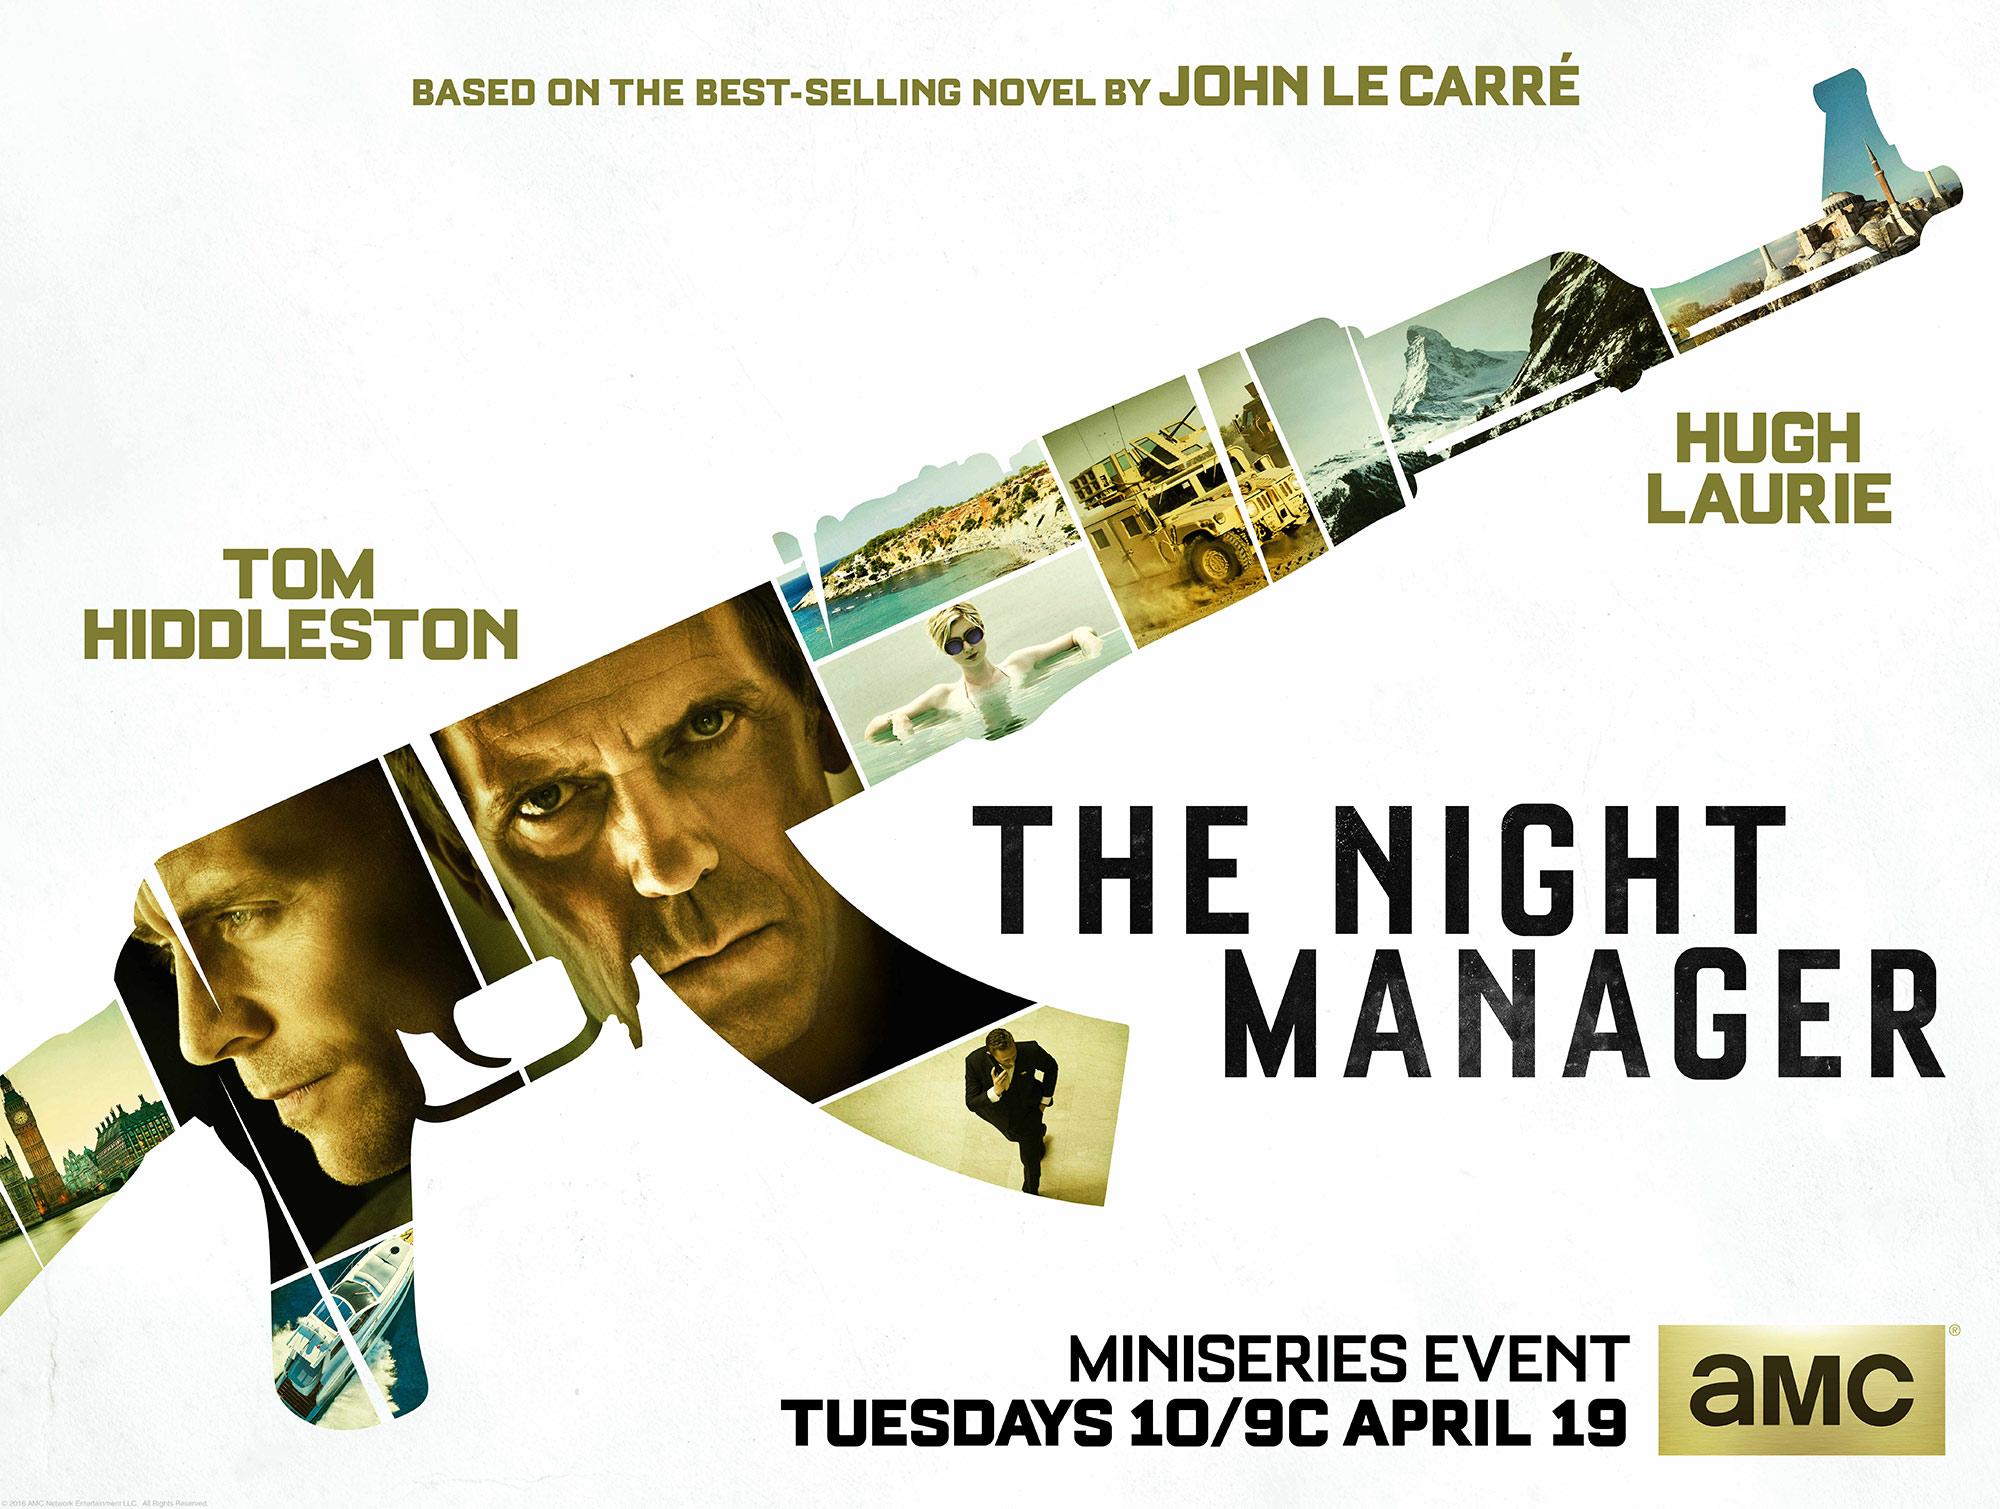 the-night-manager-key-art-poster-2000x.jpg